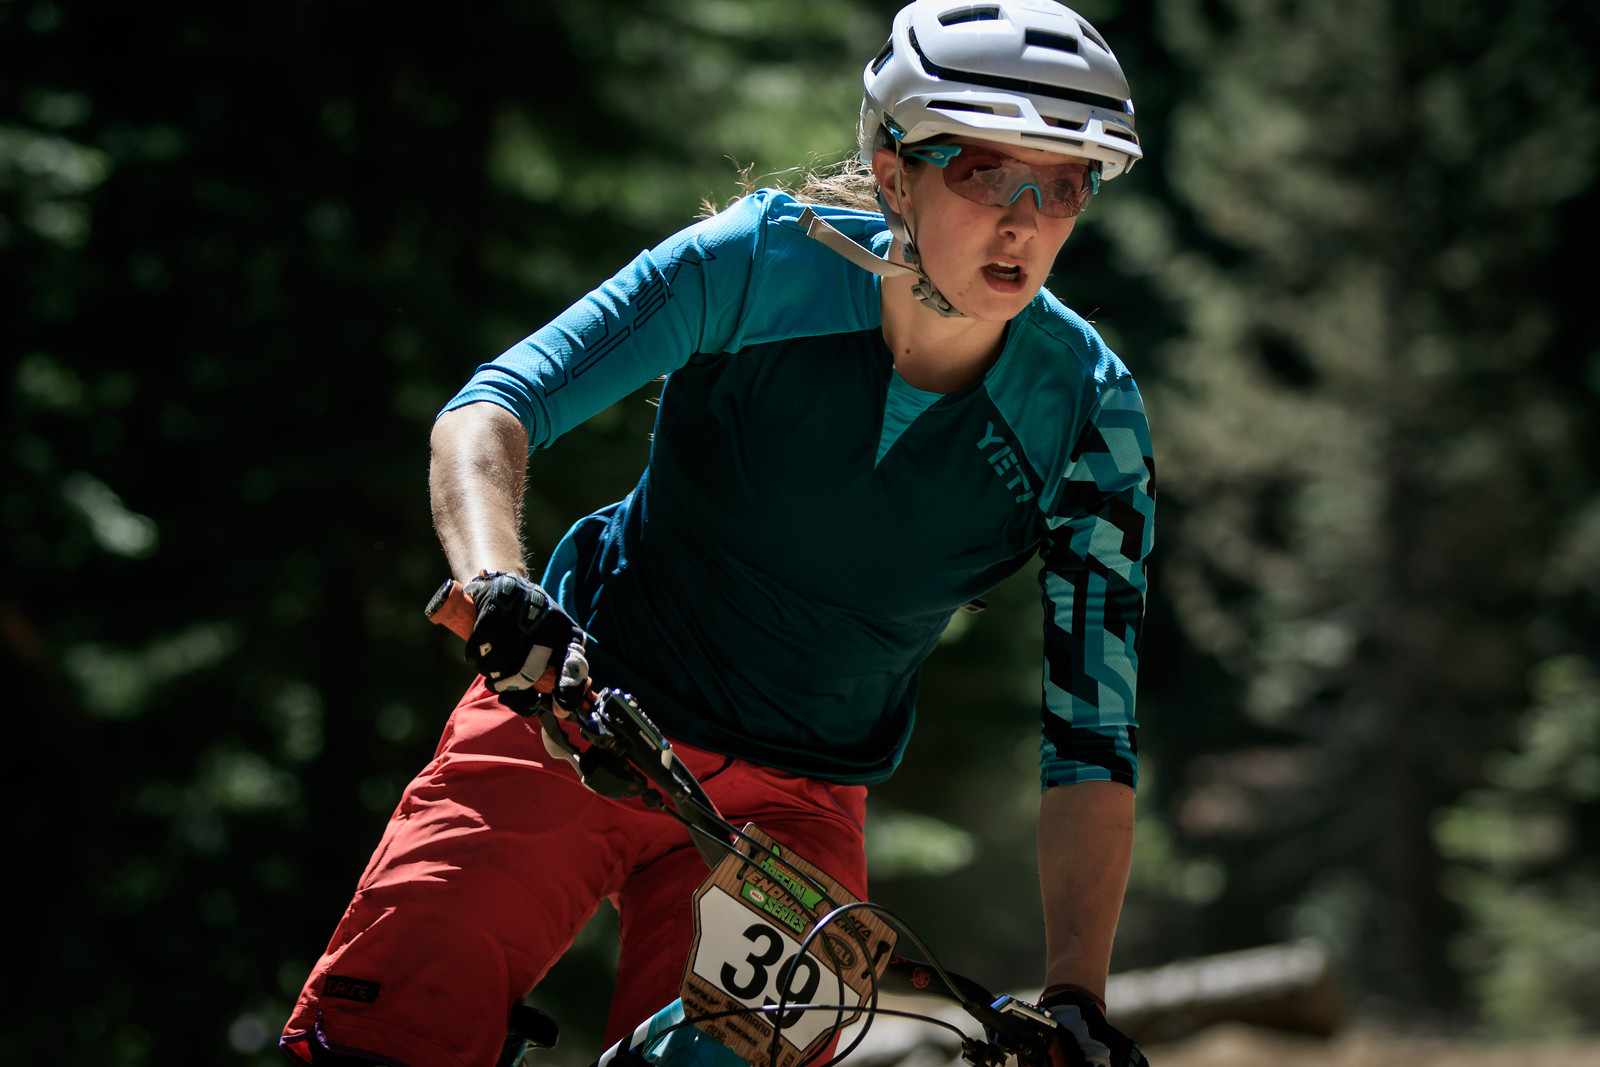 Kim Russell - FredLikesTrikes - Mountain Biking Pictures - Vital MTB